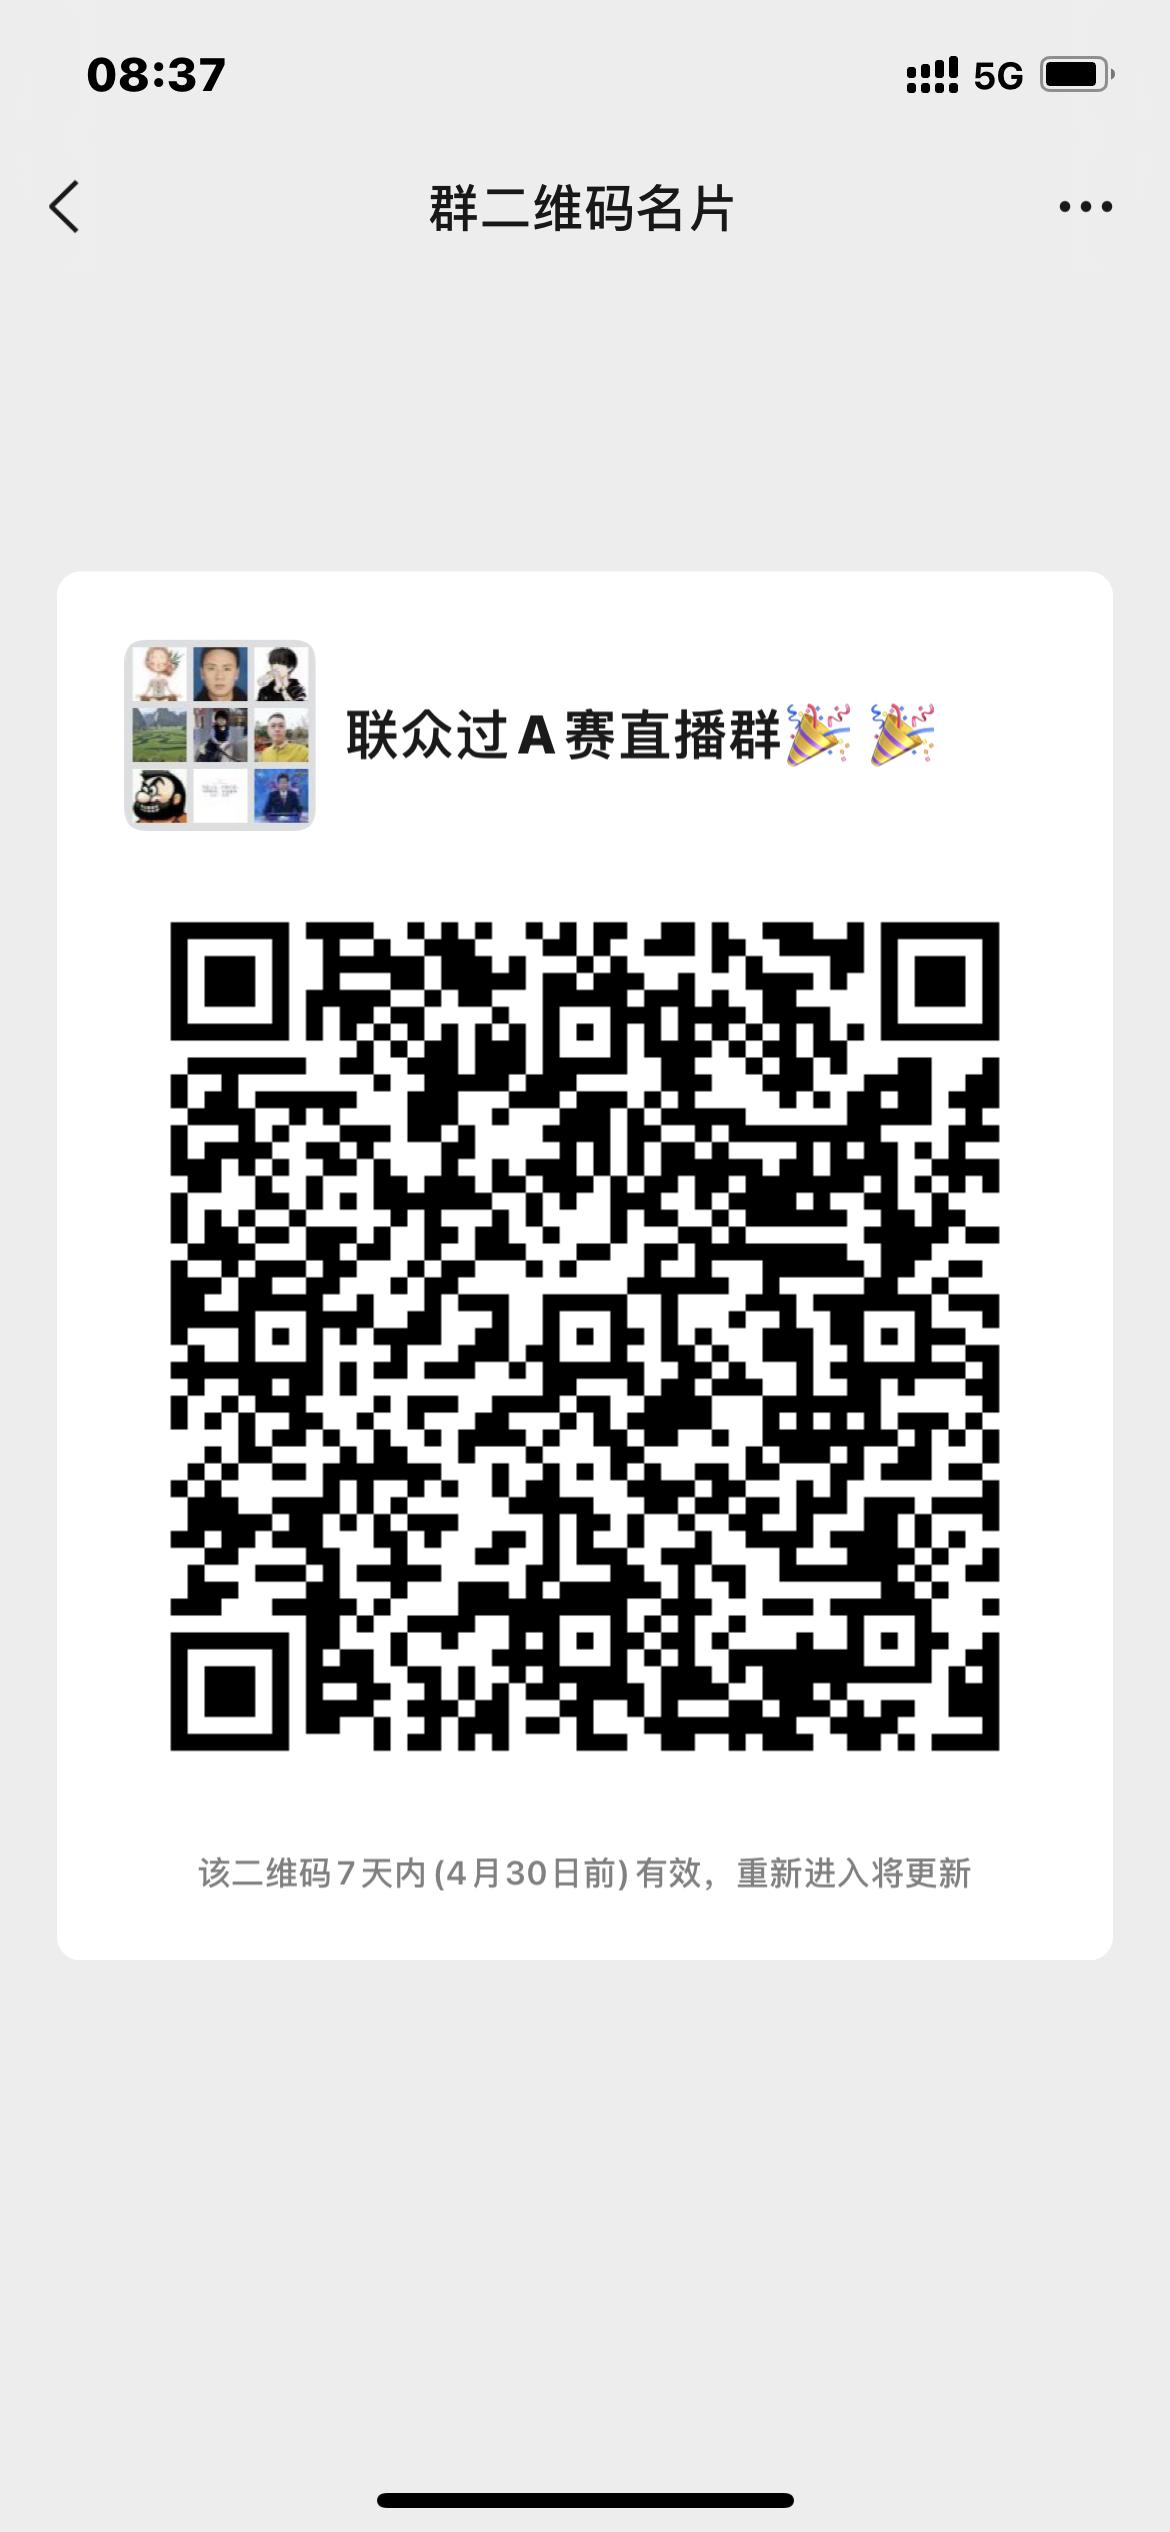 2018b3a6ad262cd48a57ee4abb3b269.png